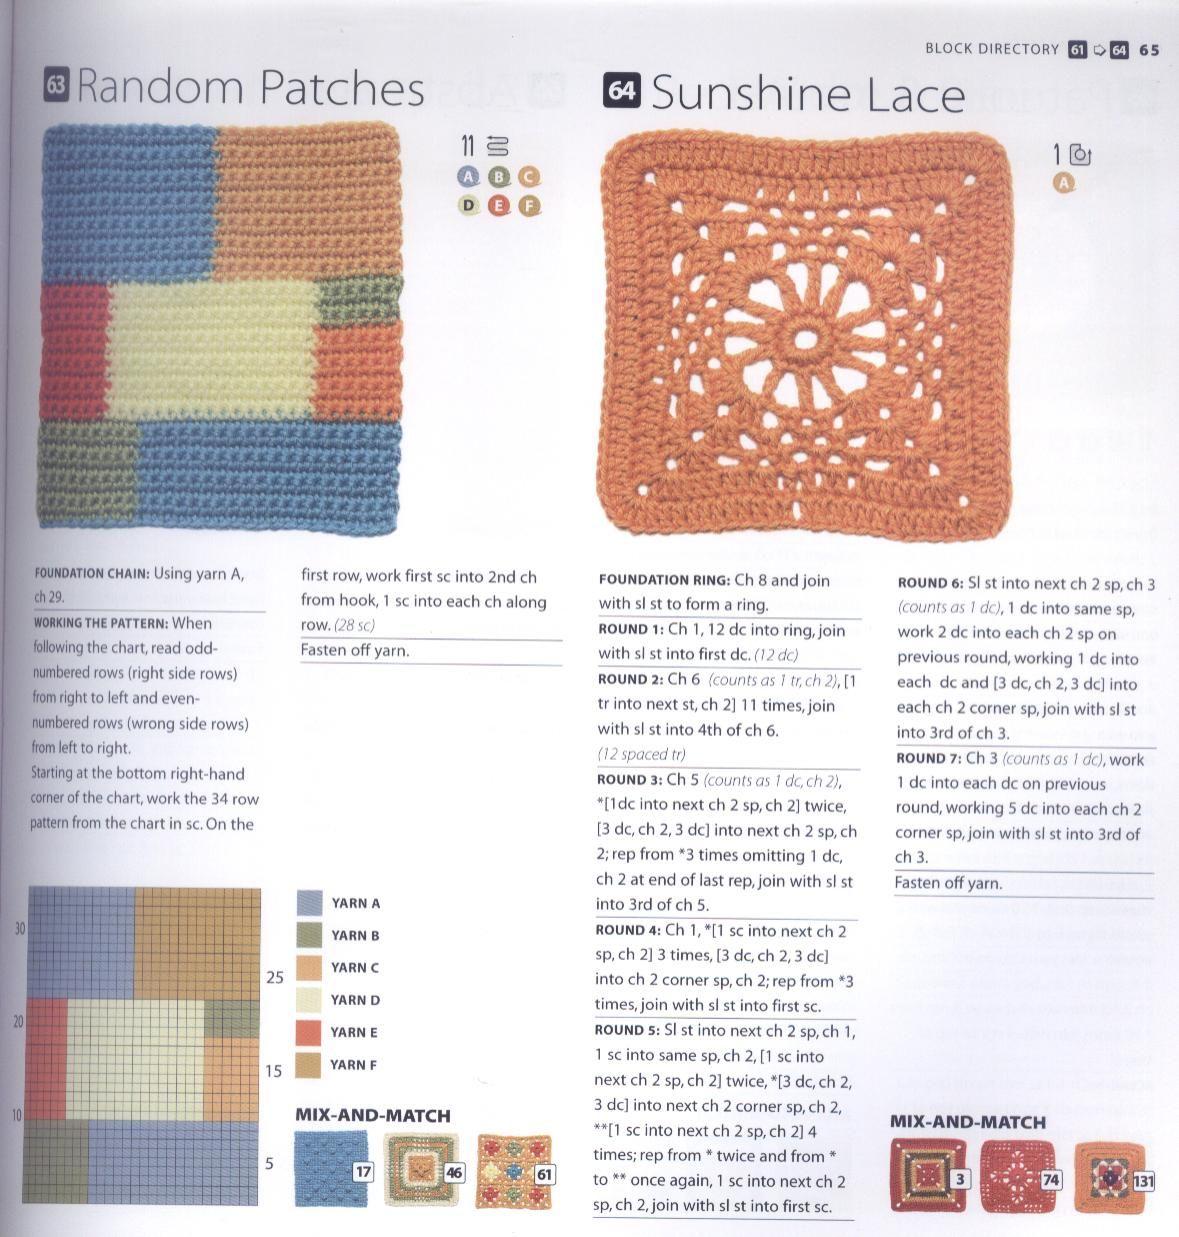 200 Crocheted Blocks for blankets, throws & Afghans 065